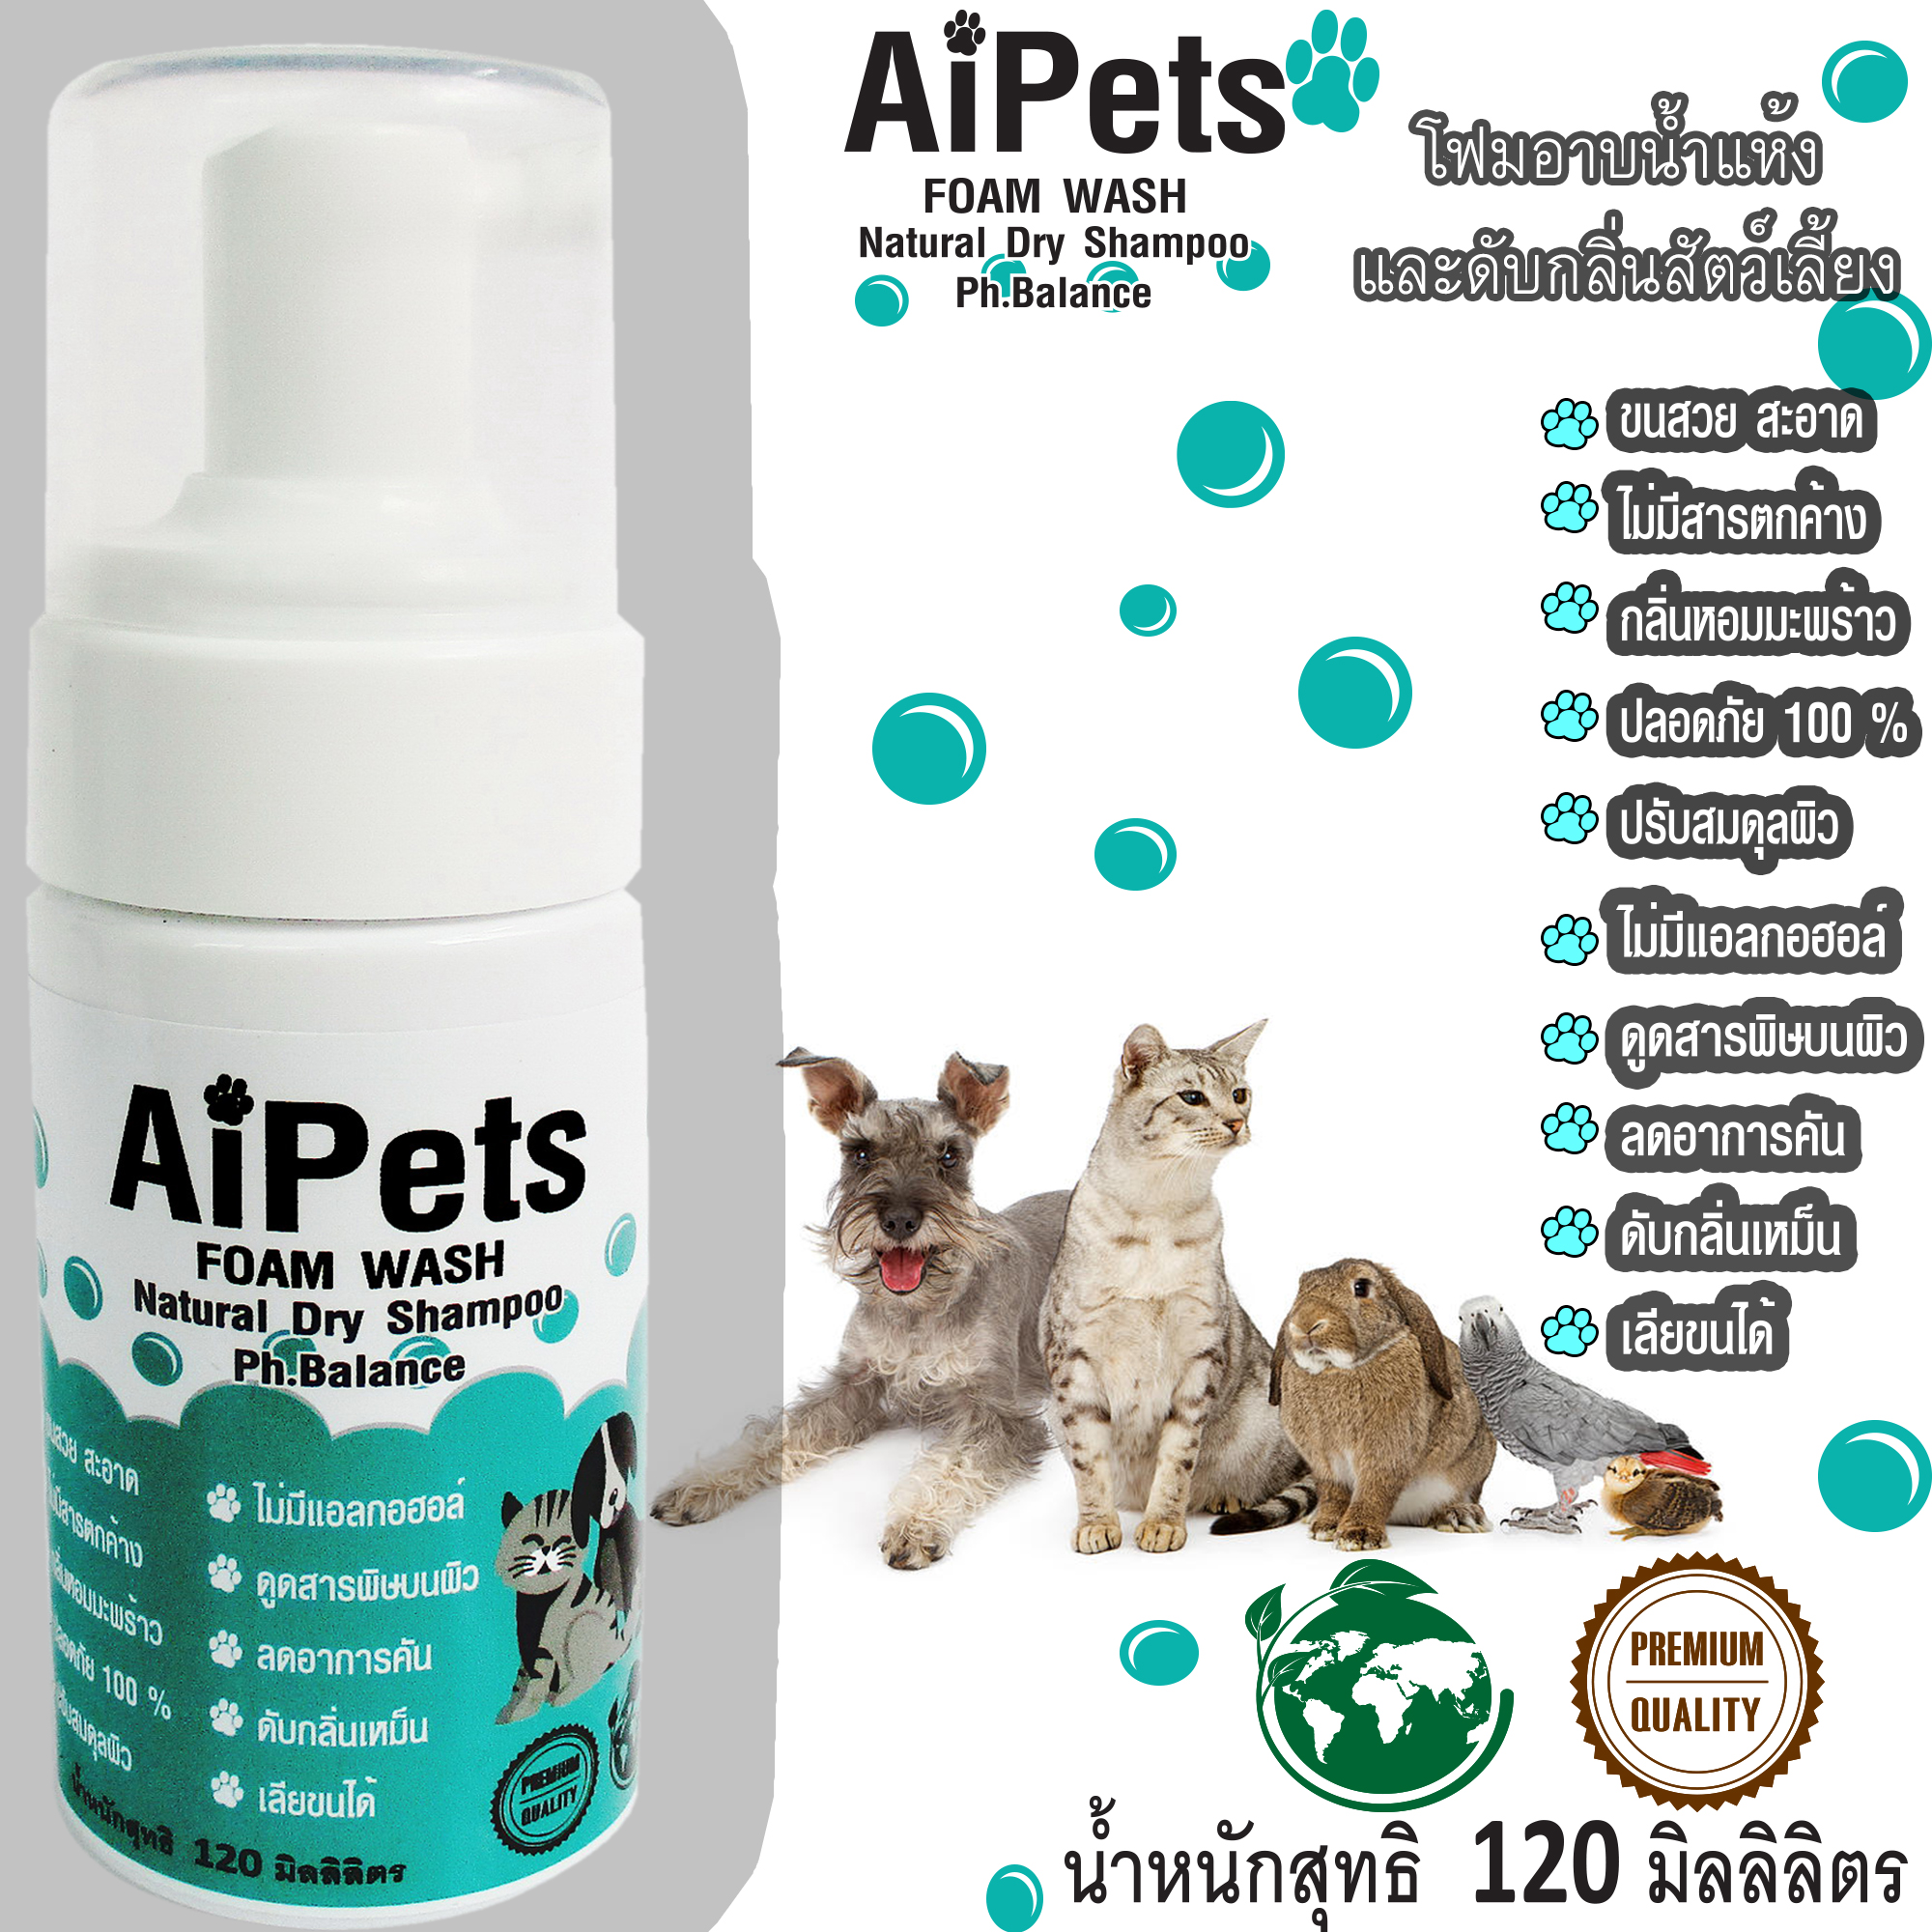 Aipetsโฟมอาบน้ำแห้งหมาแมวสูตรอ่อนโยน กลิ่นหอม ขนสวย สะอาด ดับกลิ่น ด้วยคุณภาพจากแร่ธาตุธรรมชาติที่ได้จากน้ำแร่คุณภาพสูง.